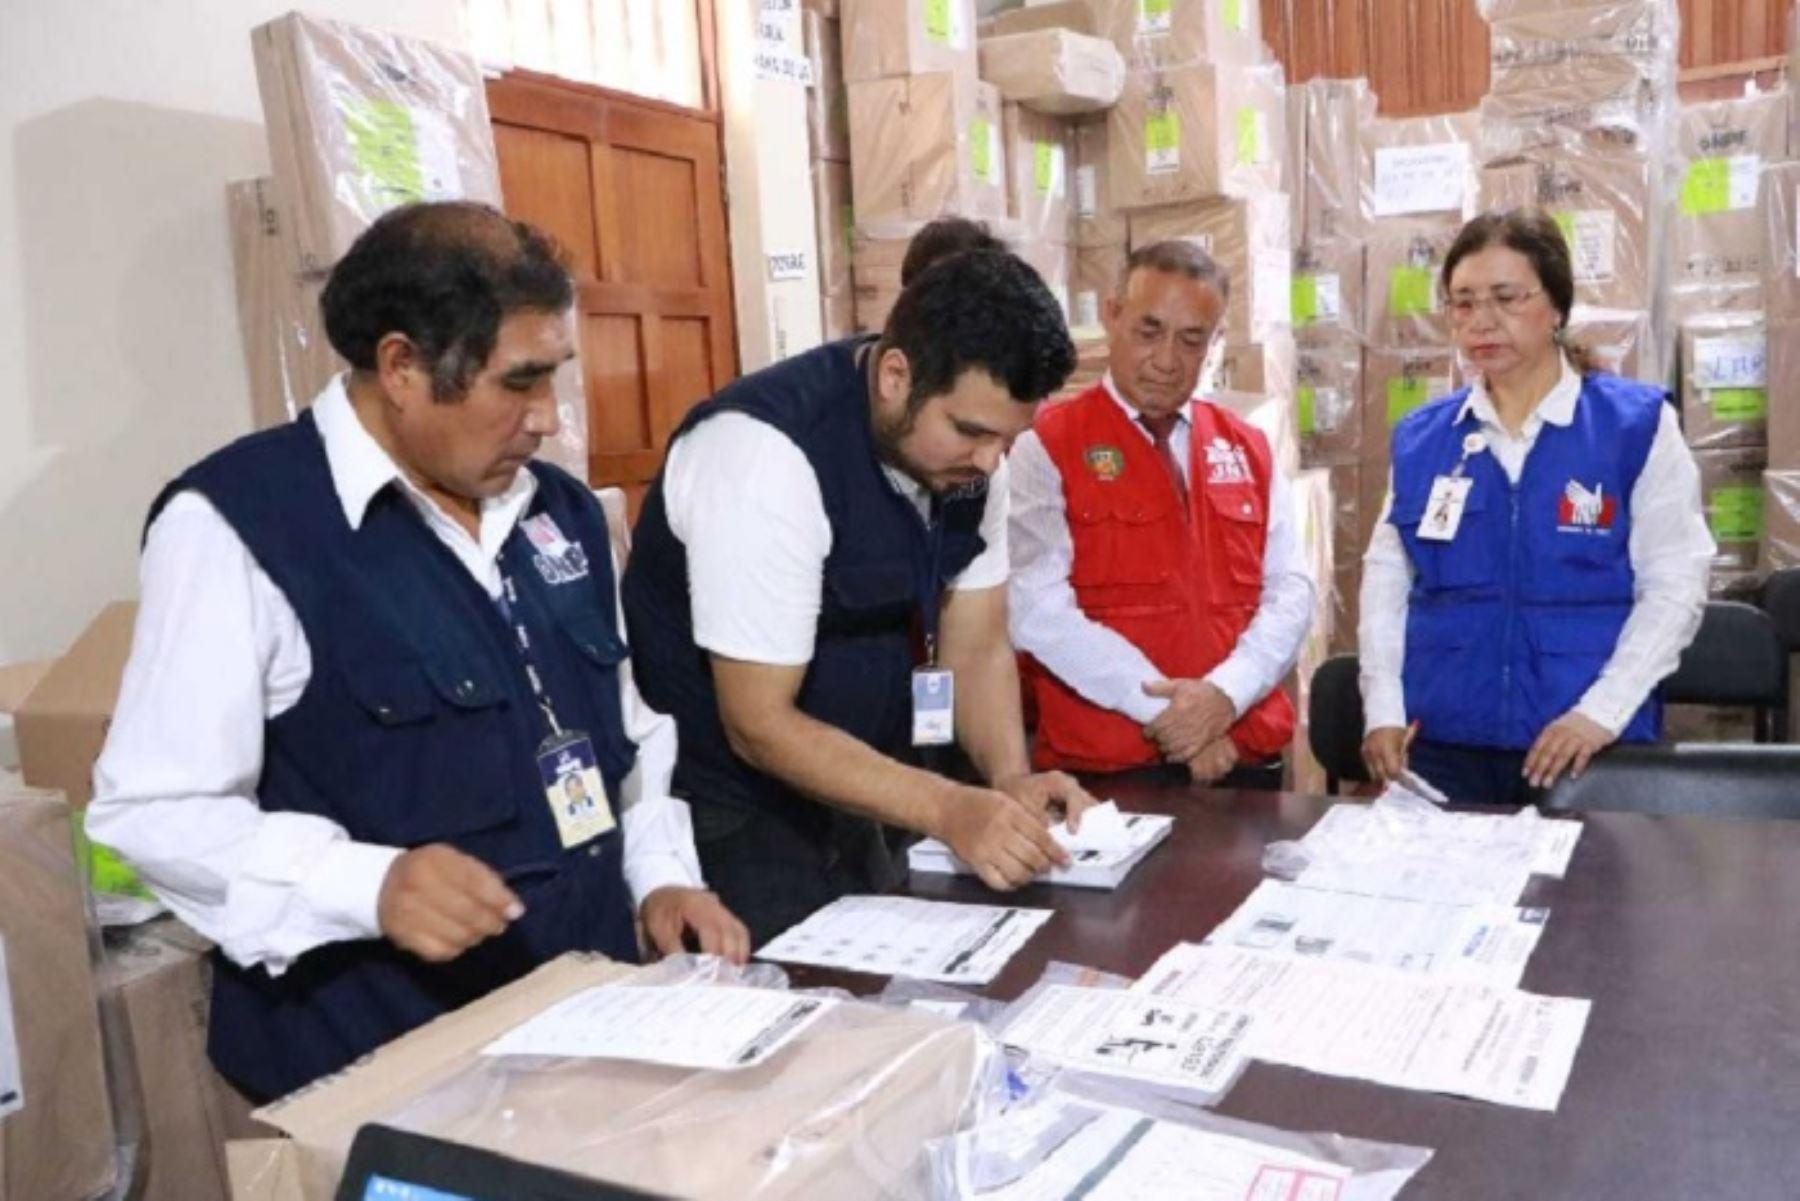 Trujillo: autoridades revisan material electoral para referéndum